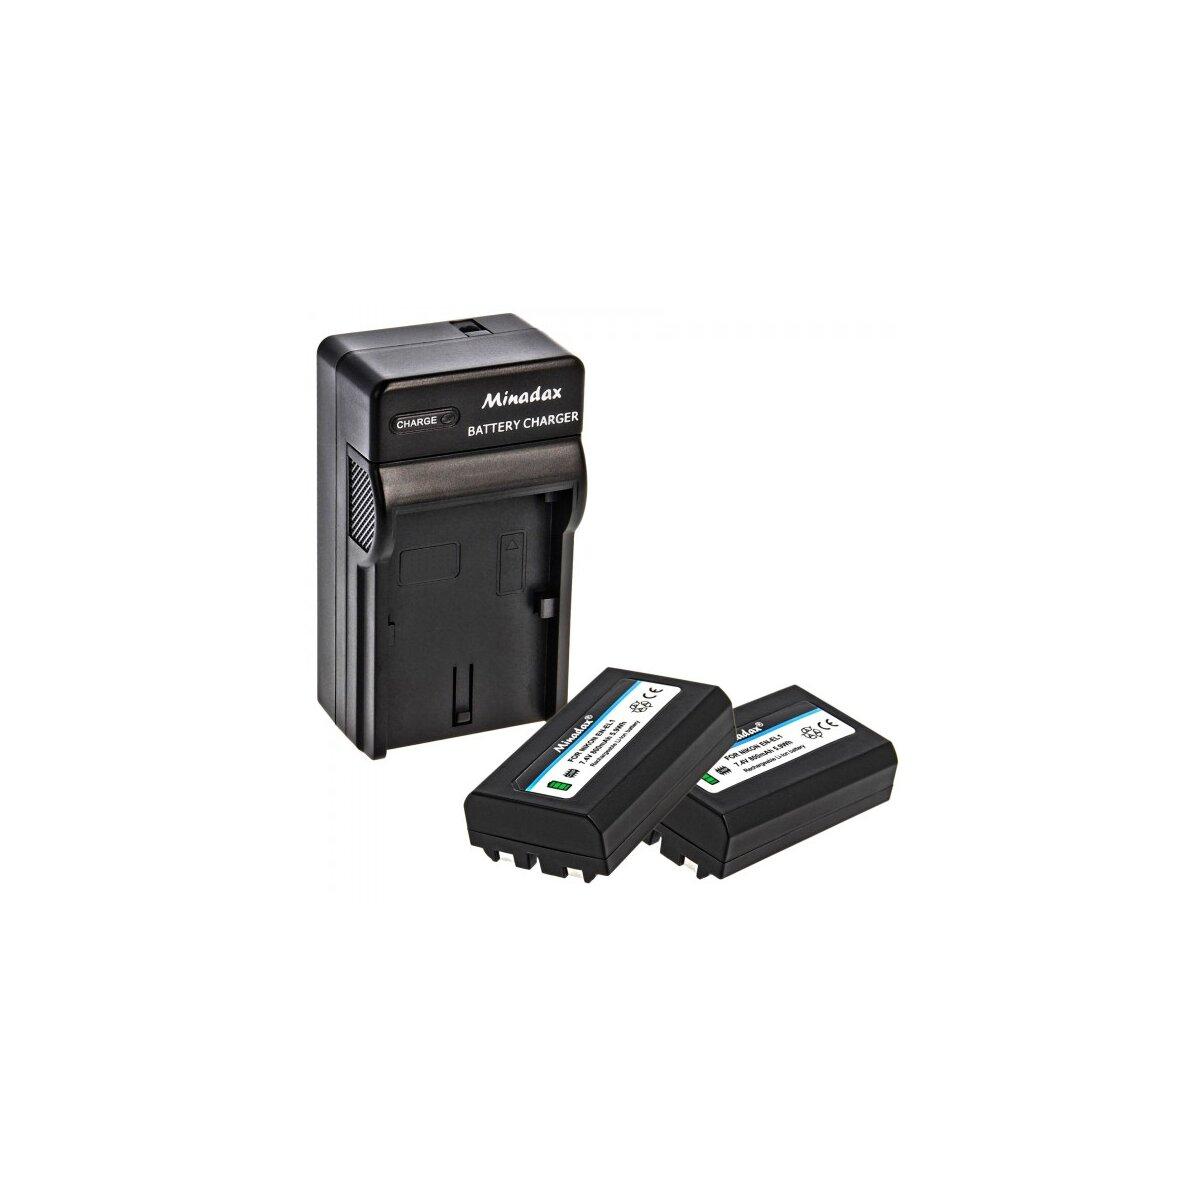 Minadax® Ladegerät 100% kompatibel mit Nikon EN-EL1 inkl. Auto Ladekabel, Ladeschale austauschbar + 2x Akku Ersatz für EN-EL1